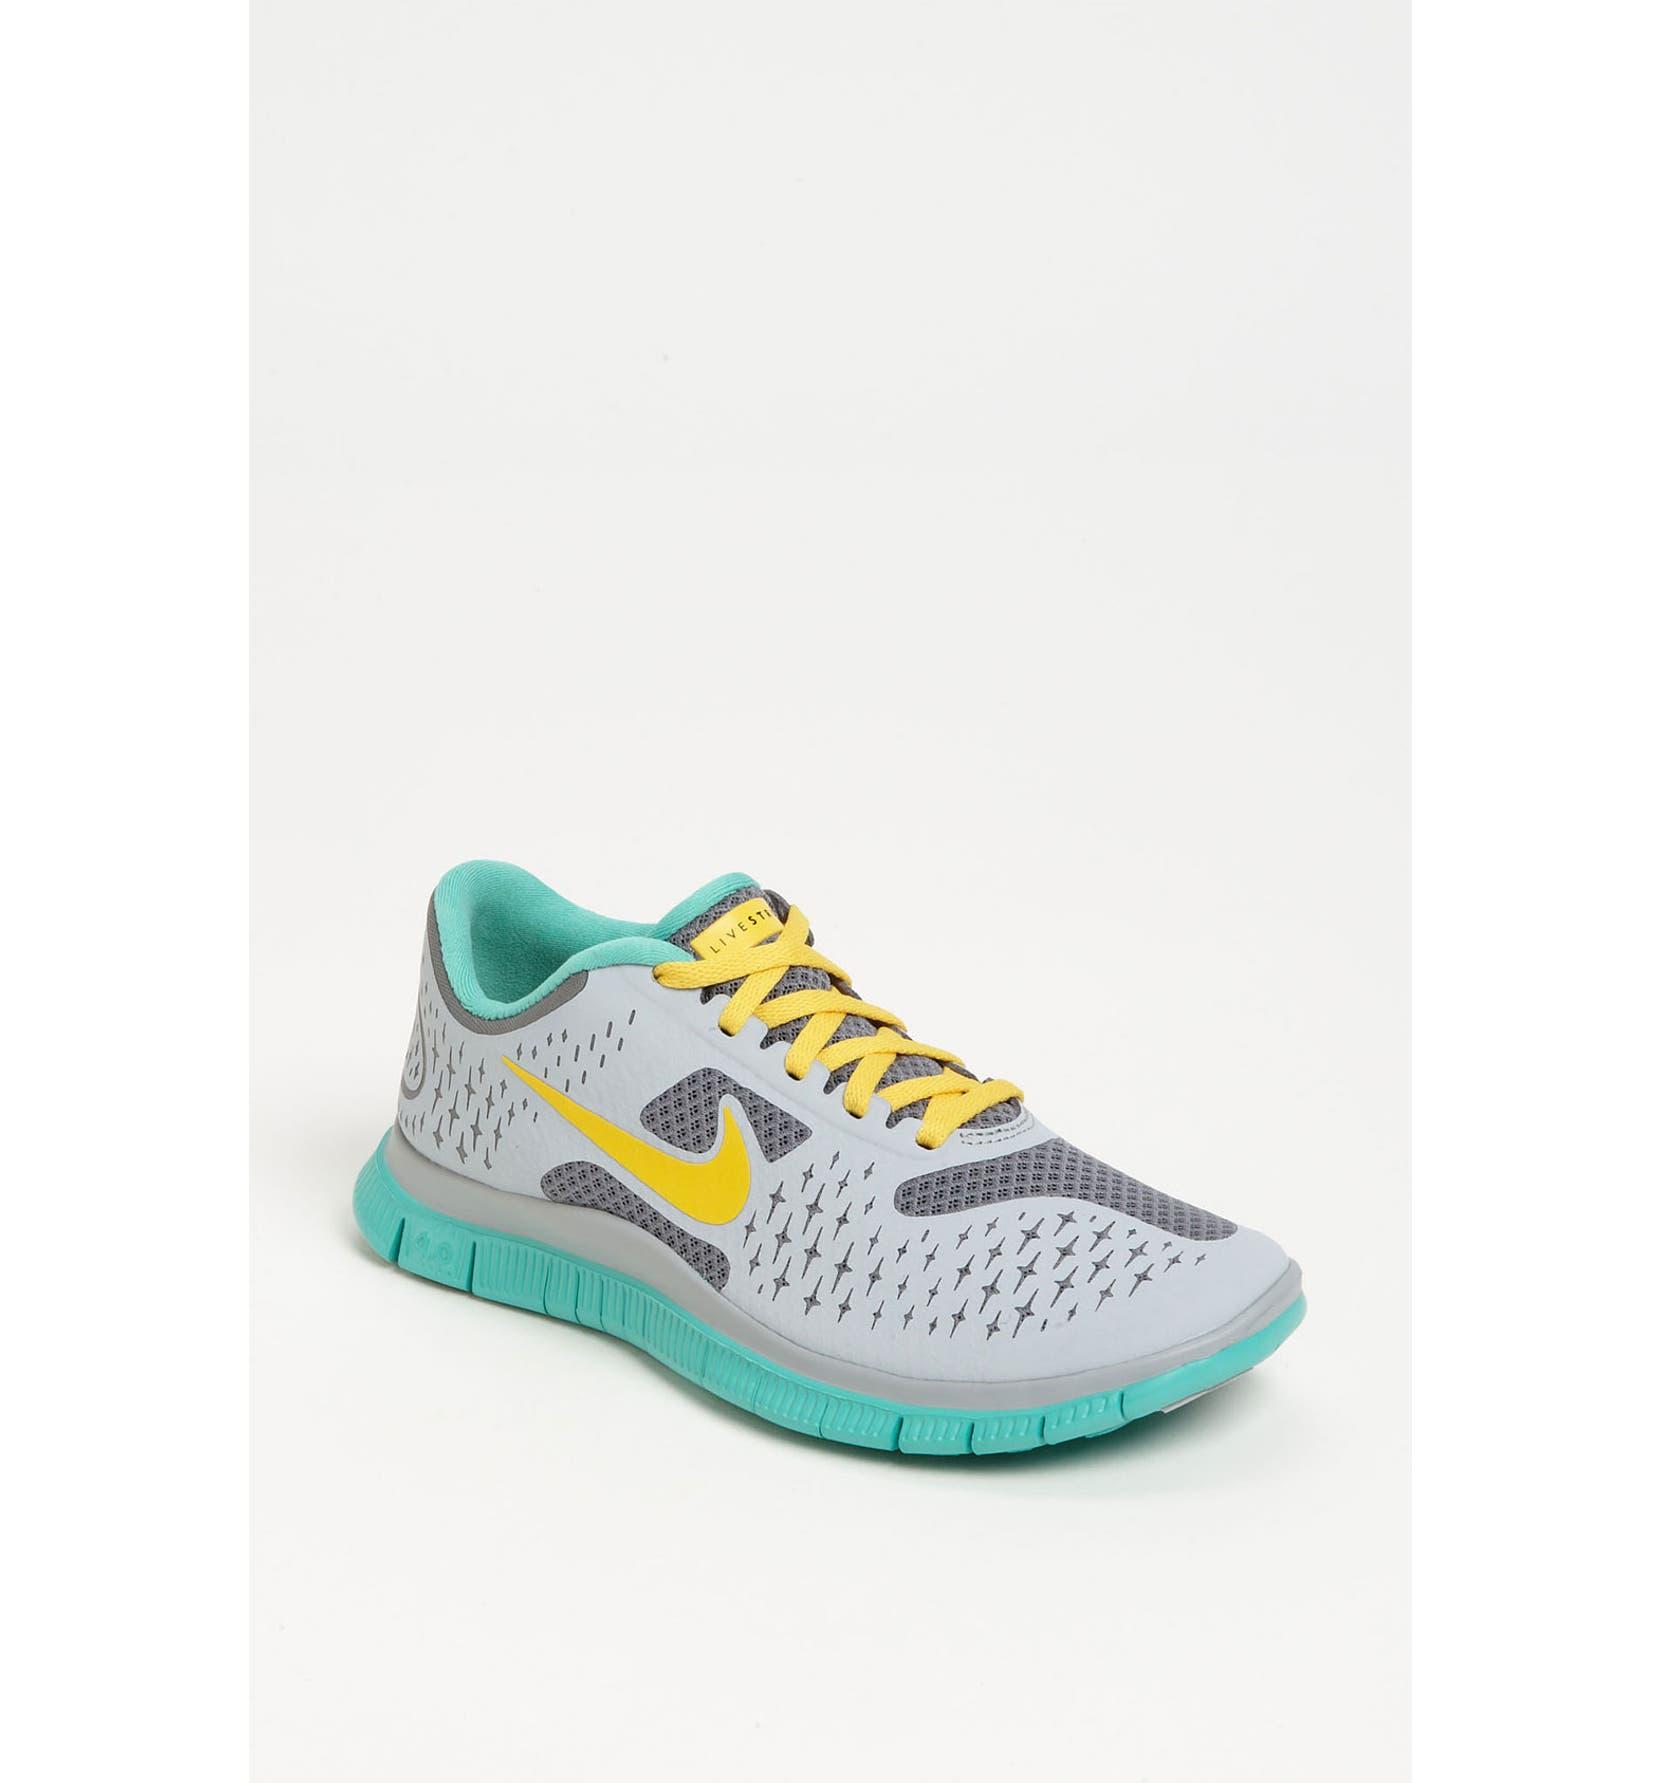 promo code f4ec0 c740a Nike  Free 4.0 V2 Livestrong  Running Shoe (Women)   Nordstrom